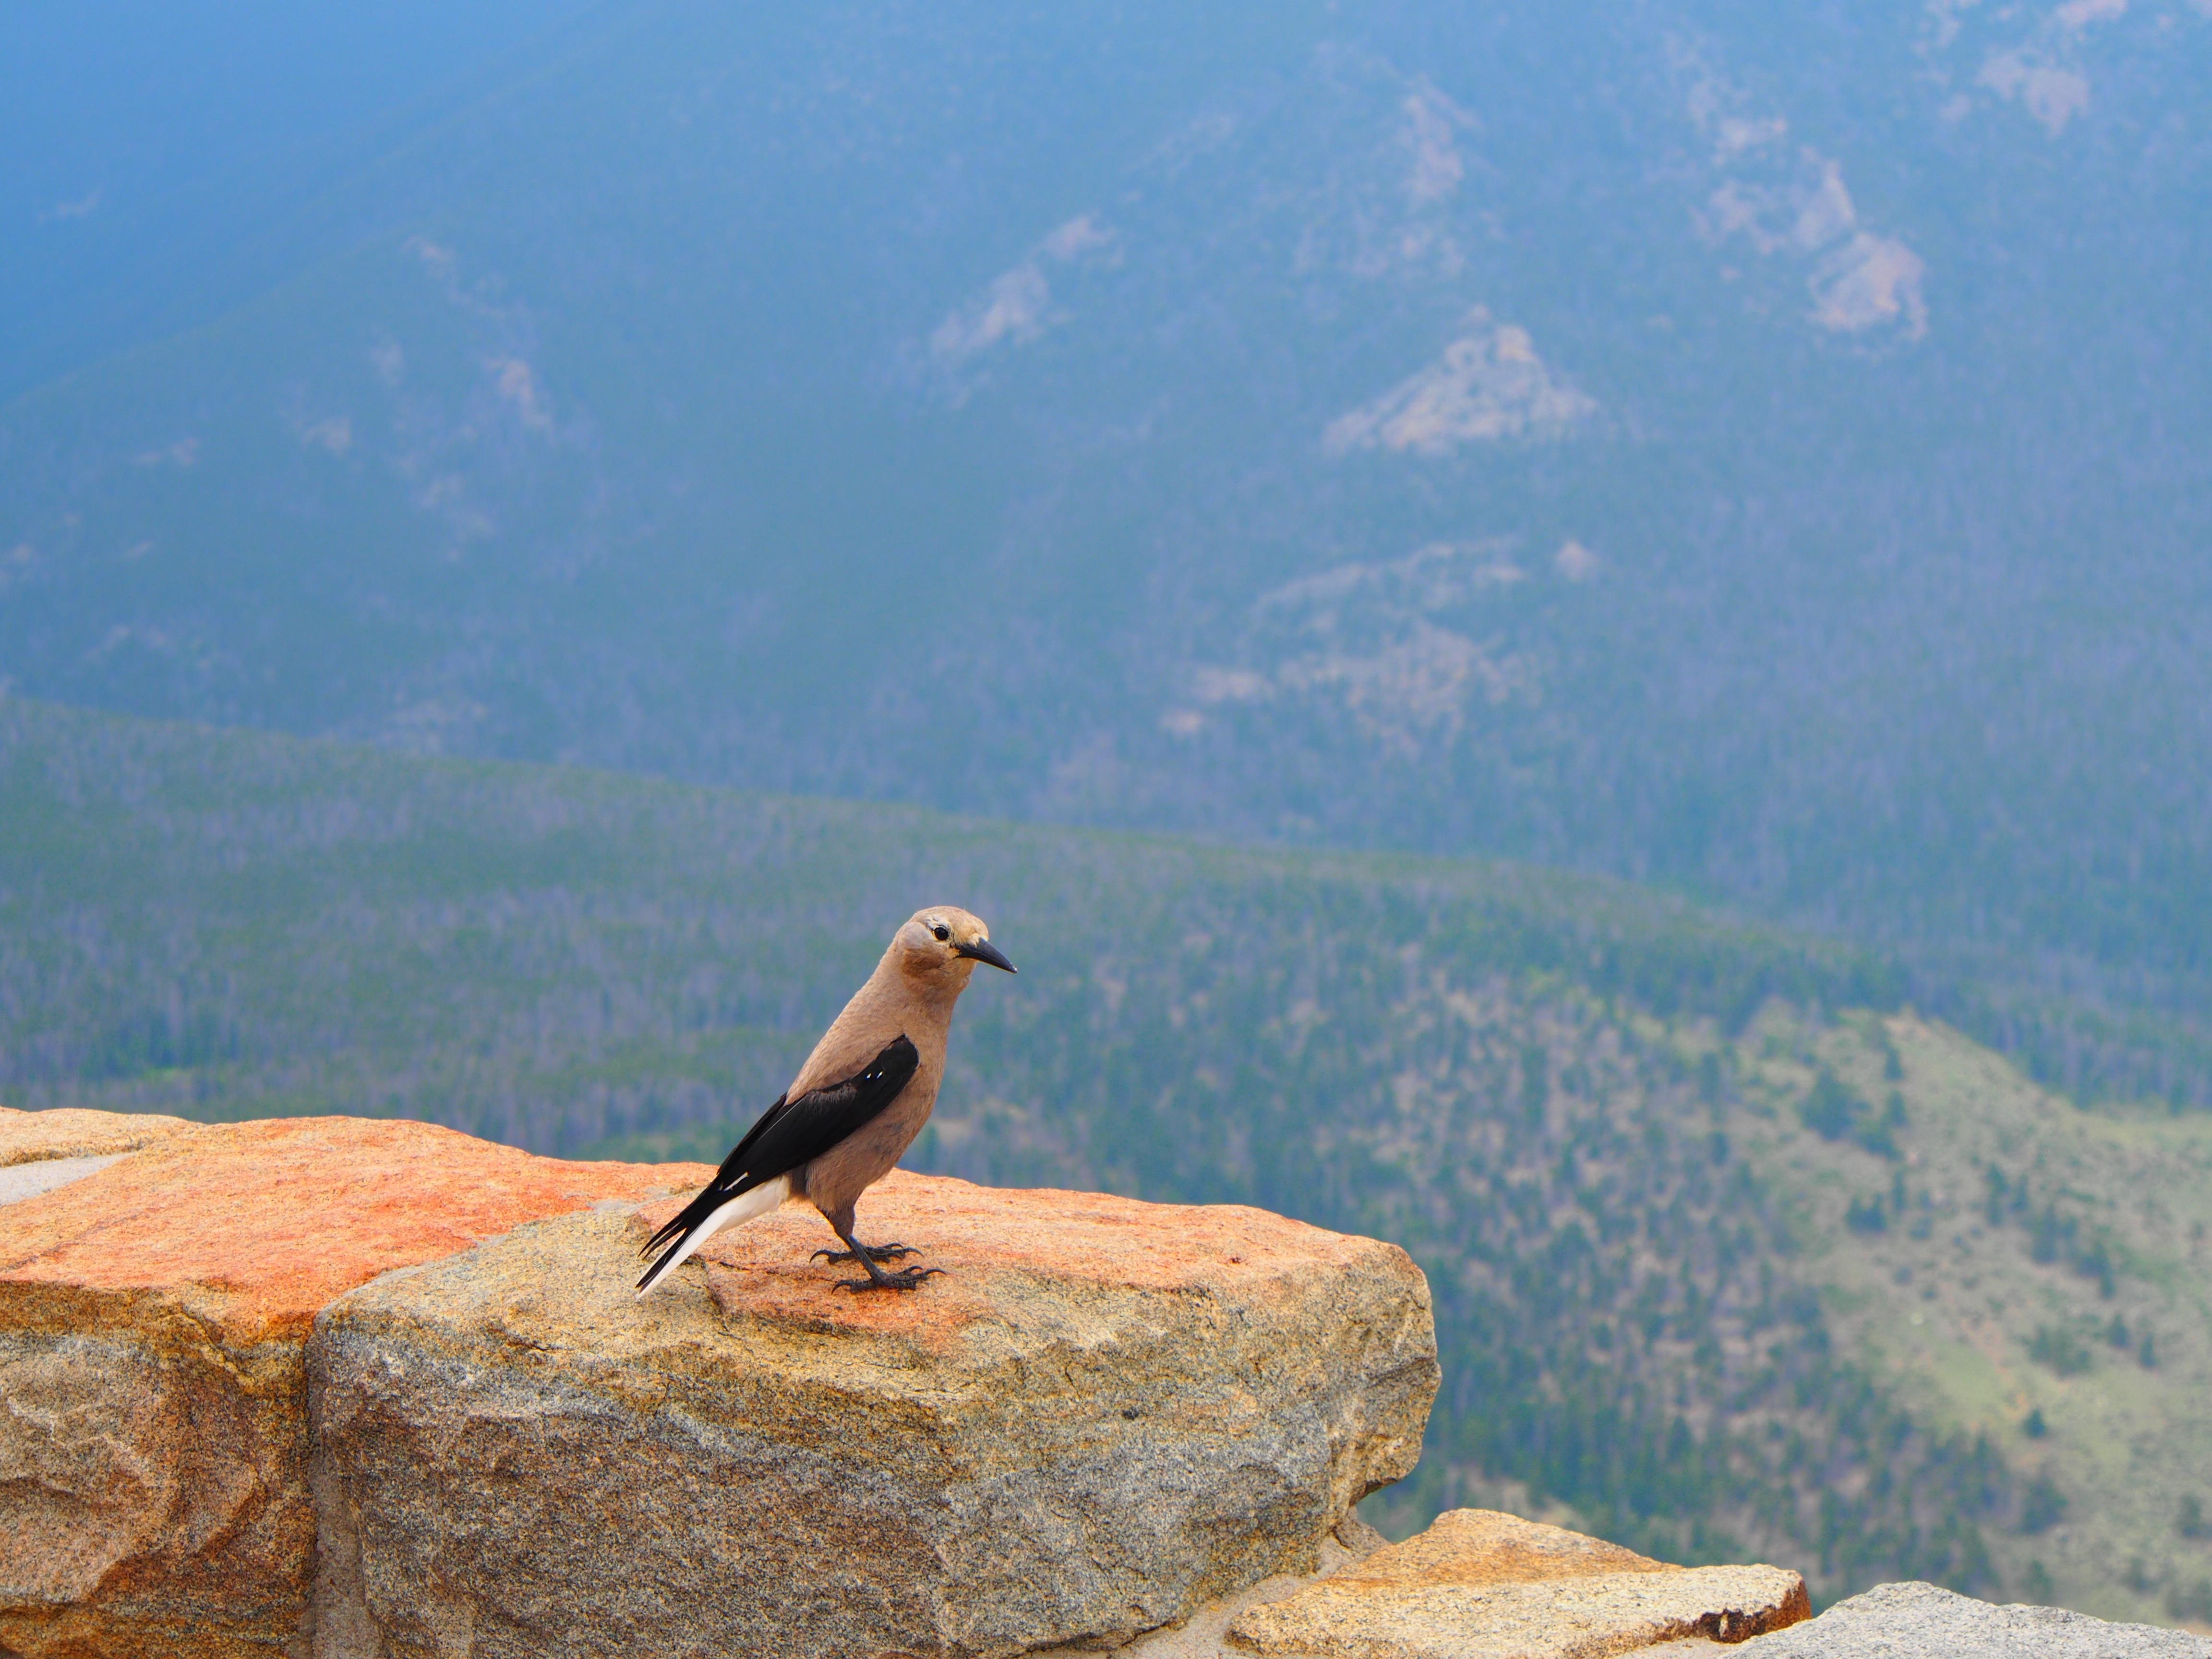 Bird on ledge, Animal, Animals, Bird, Birds, HQ Photo